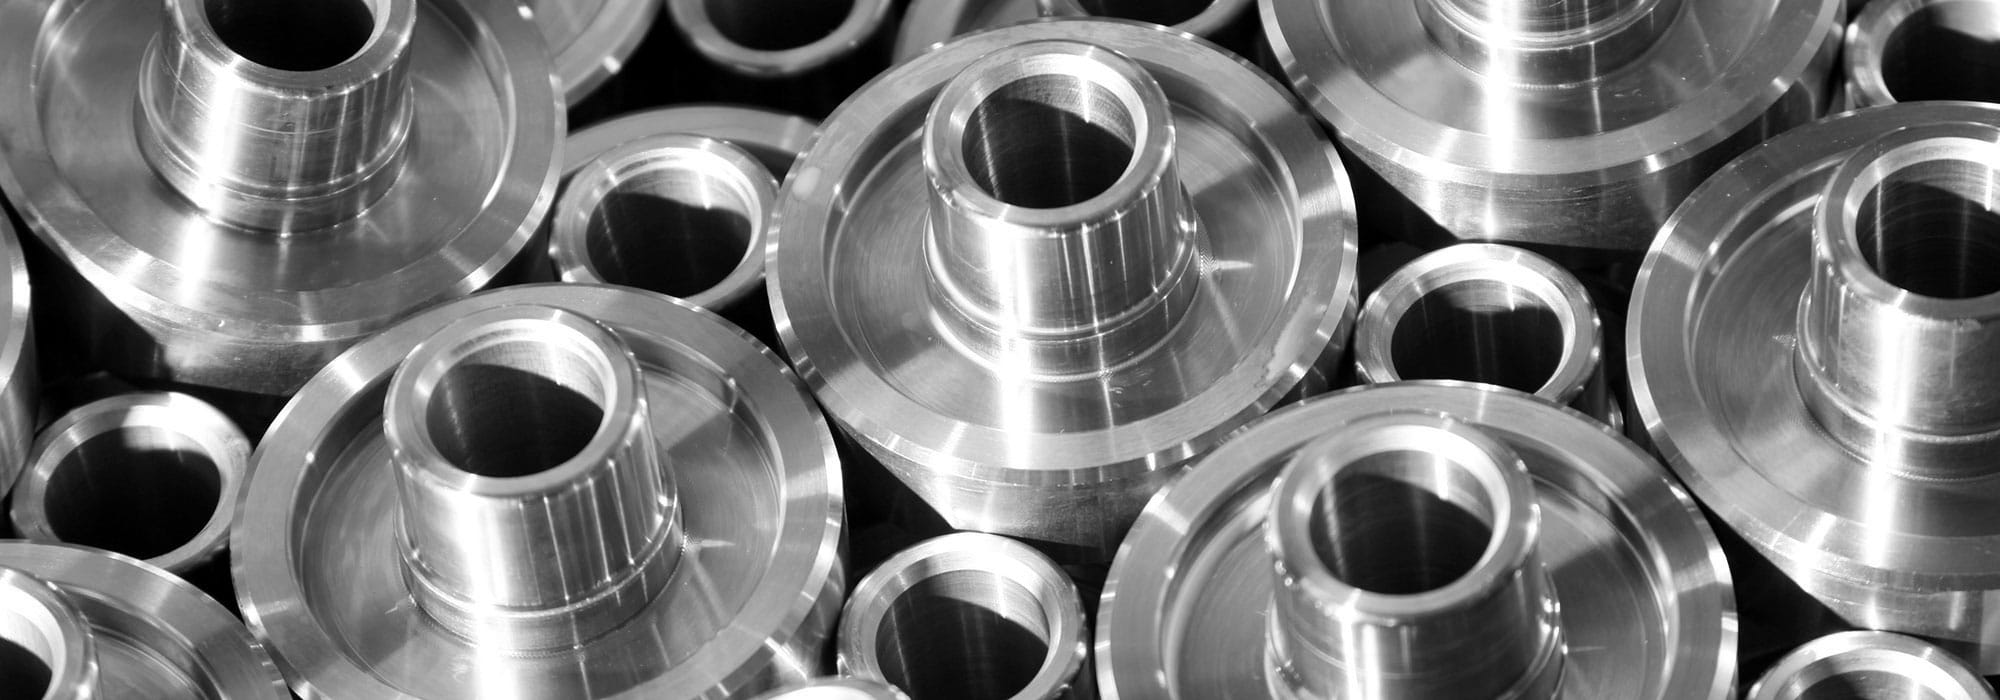 slide-metallverarbeitung